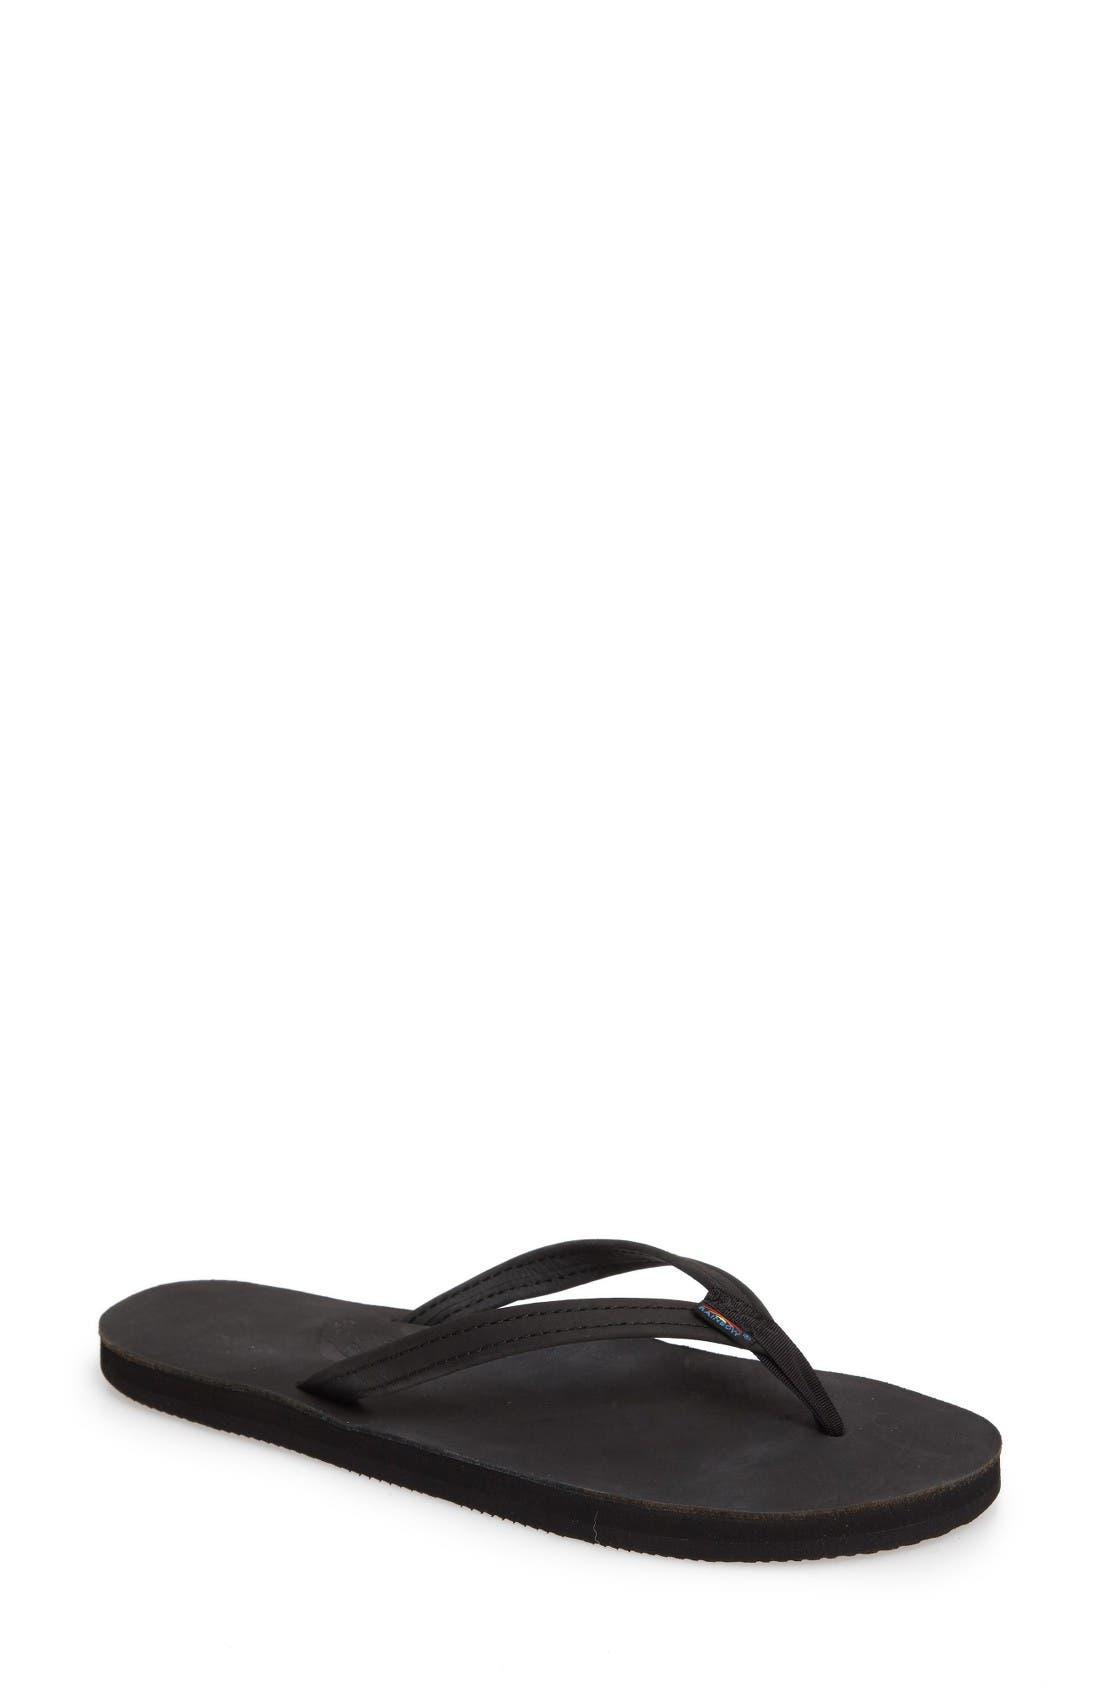 Black rainbow sandals with crystals - Black Rainbow Sandals With Crystals 8